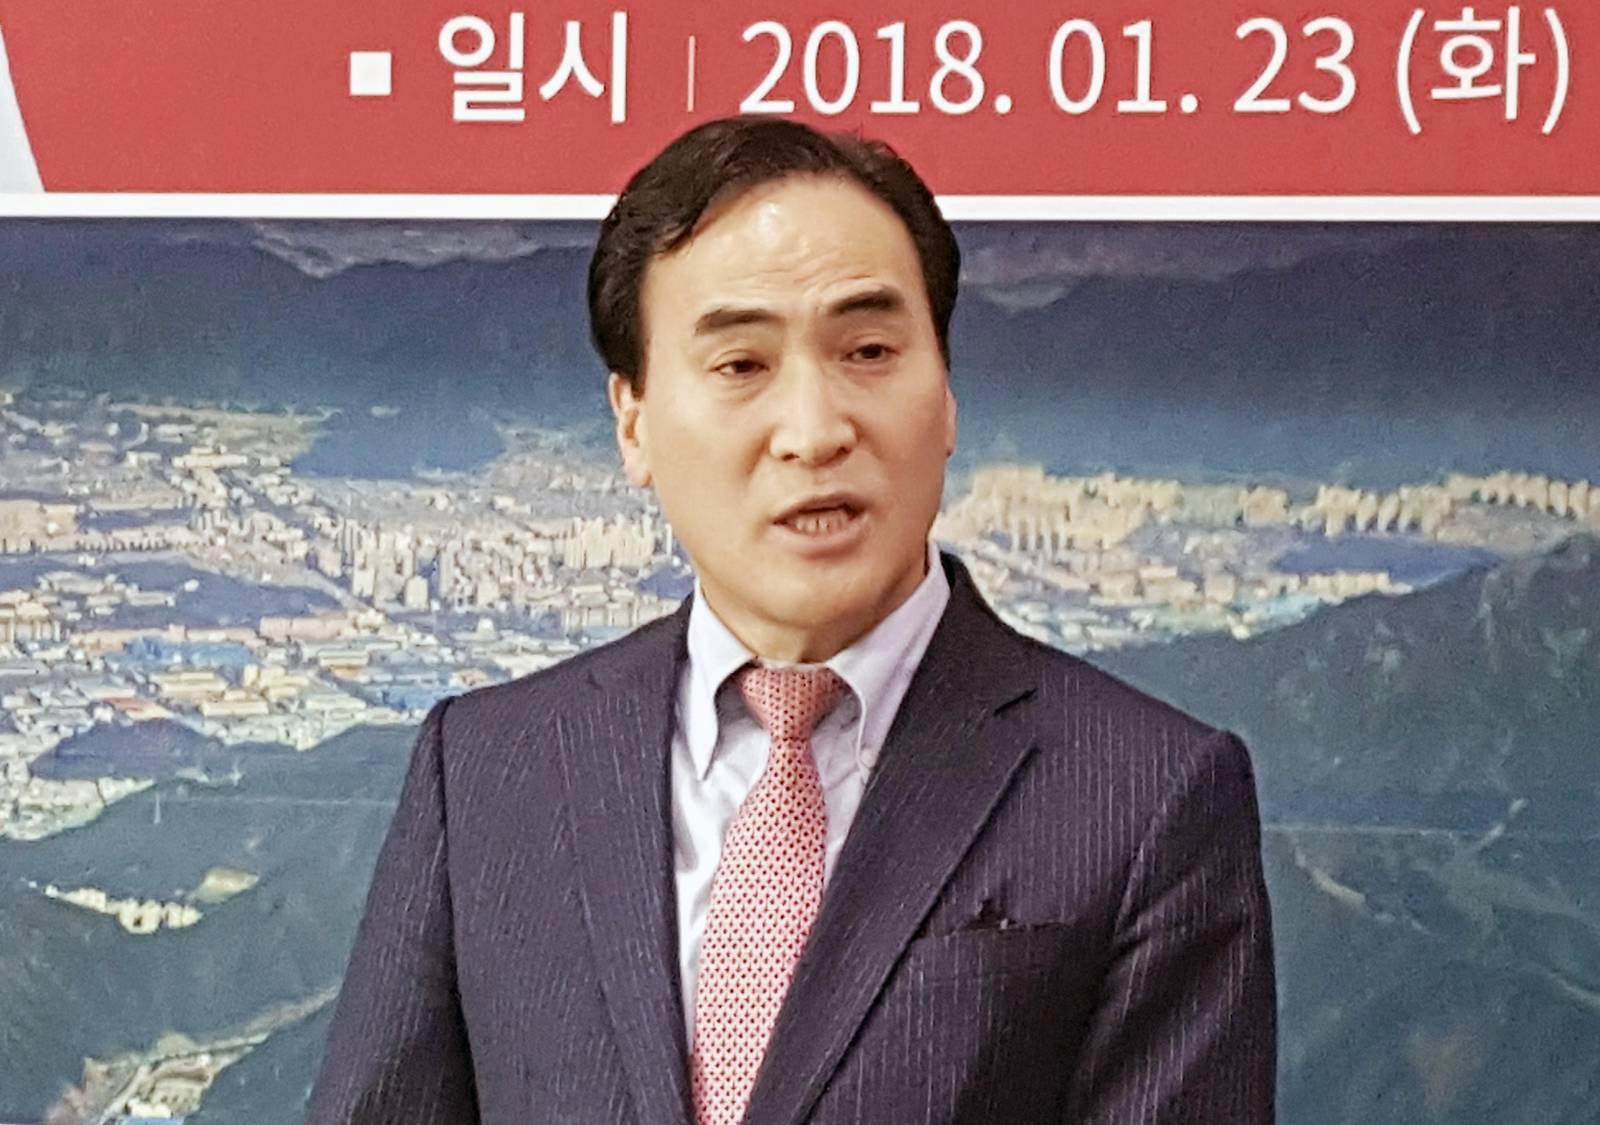 Südkoreaner Kim Jong Yang neuer Interpol-Präsident